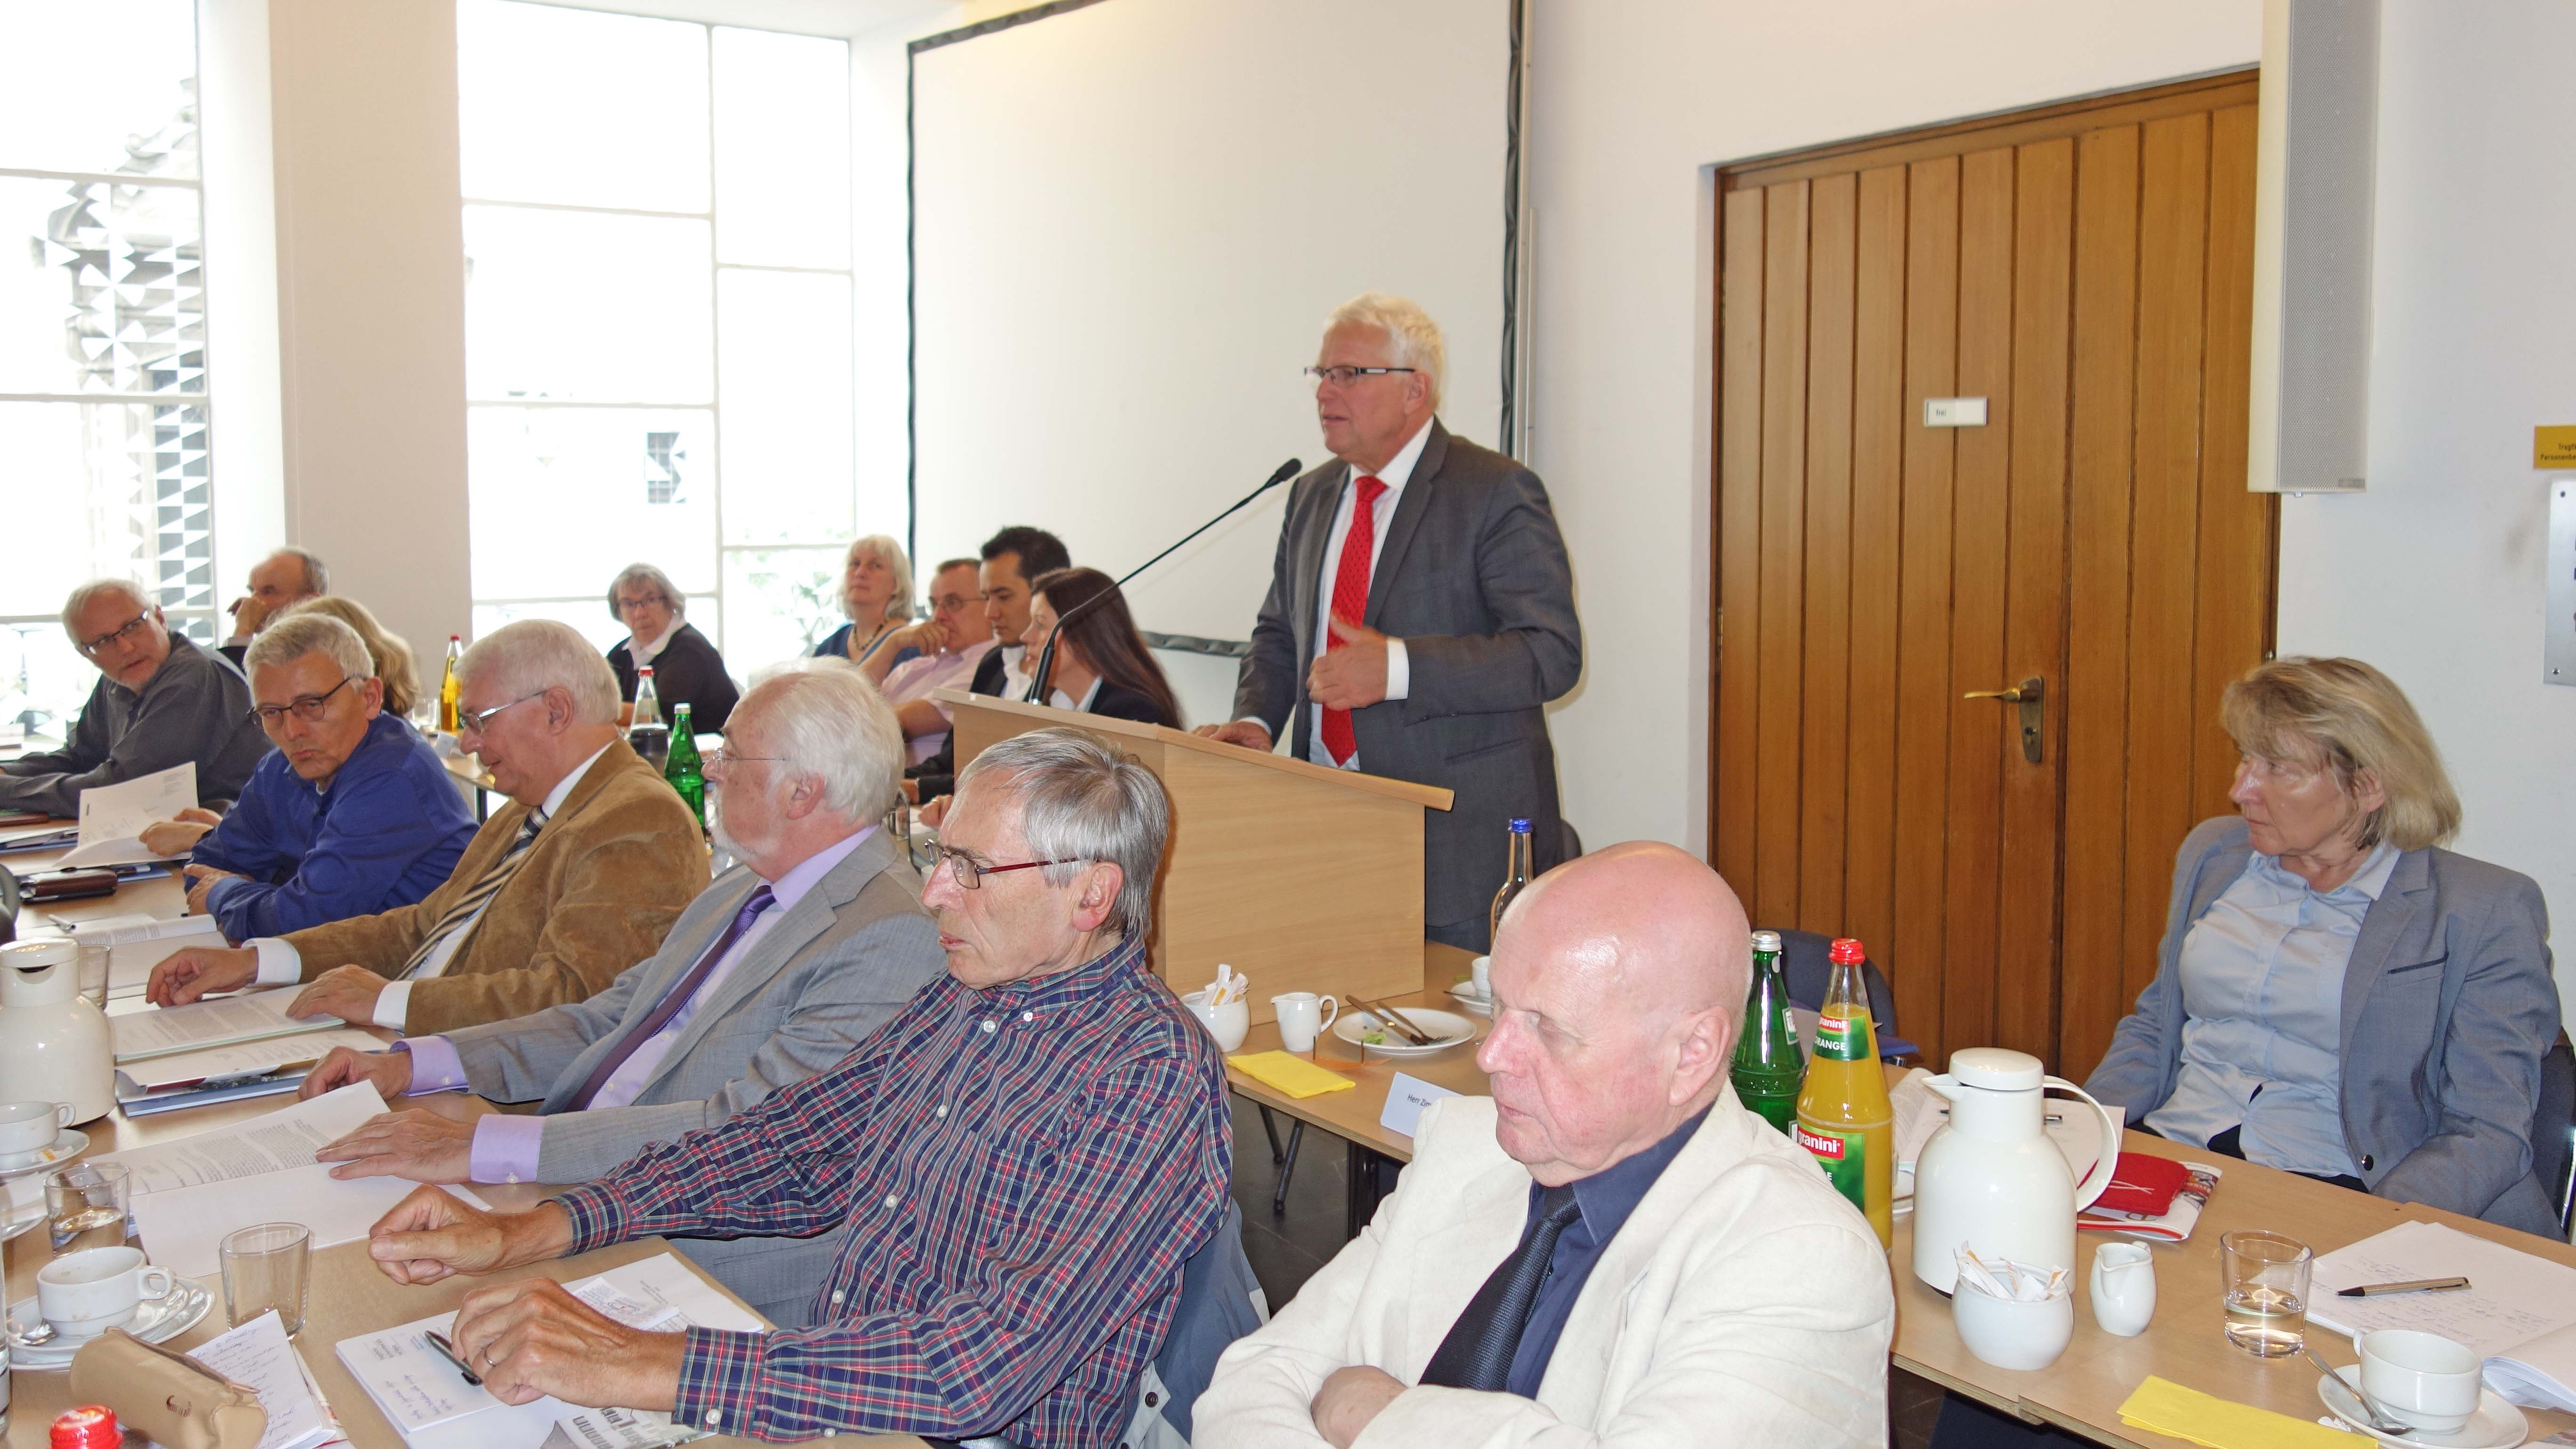 Stadtsuperintendent Rolf Domning